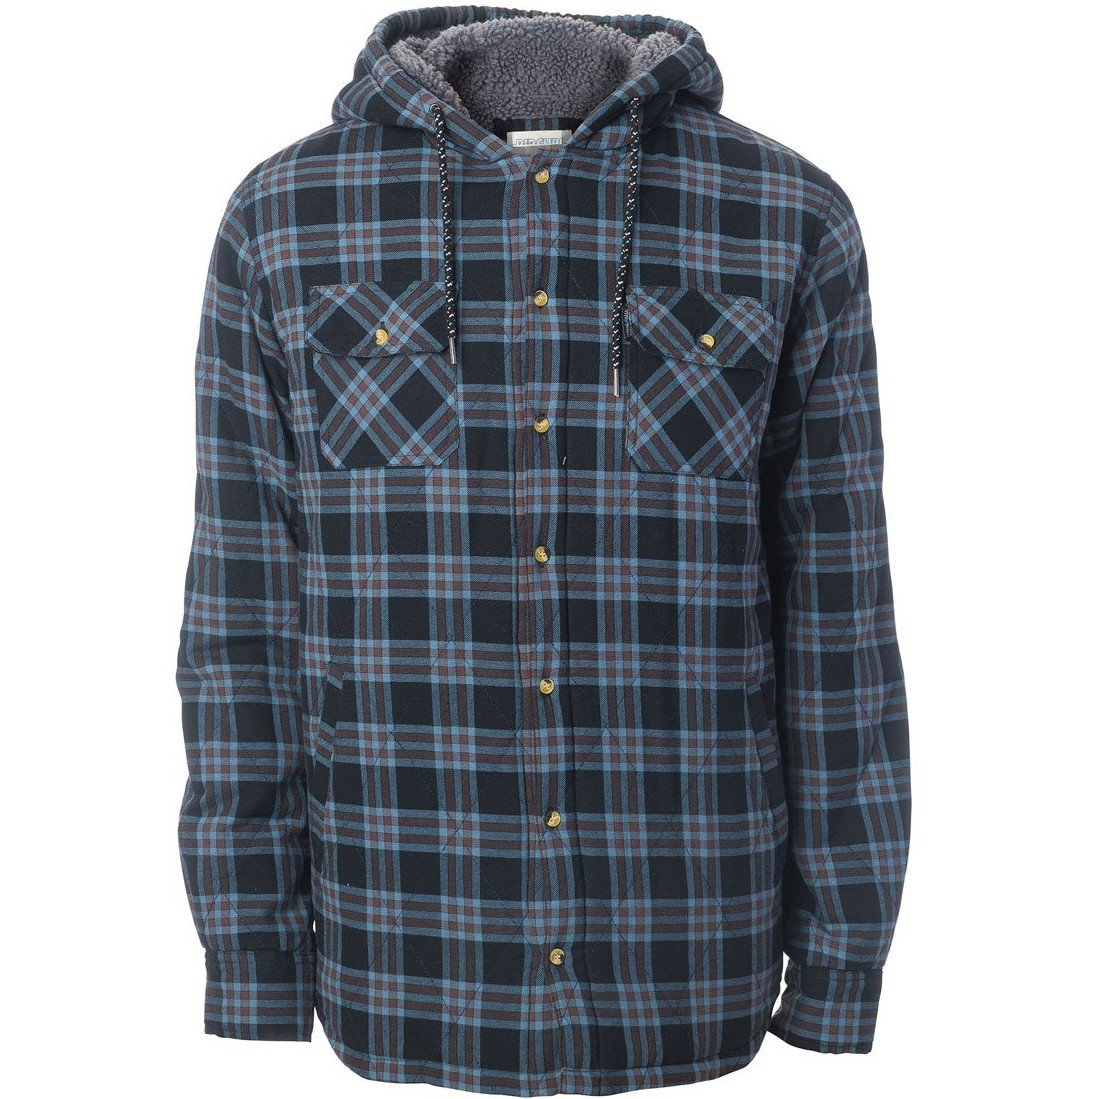 Rip Curl Sherpa Hooded Shirt Small Black by Rip Curl